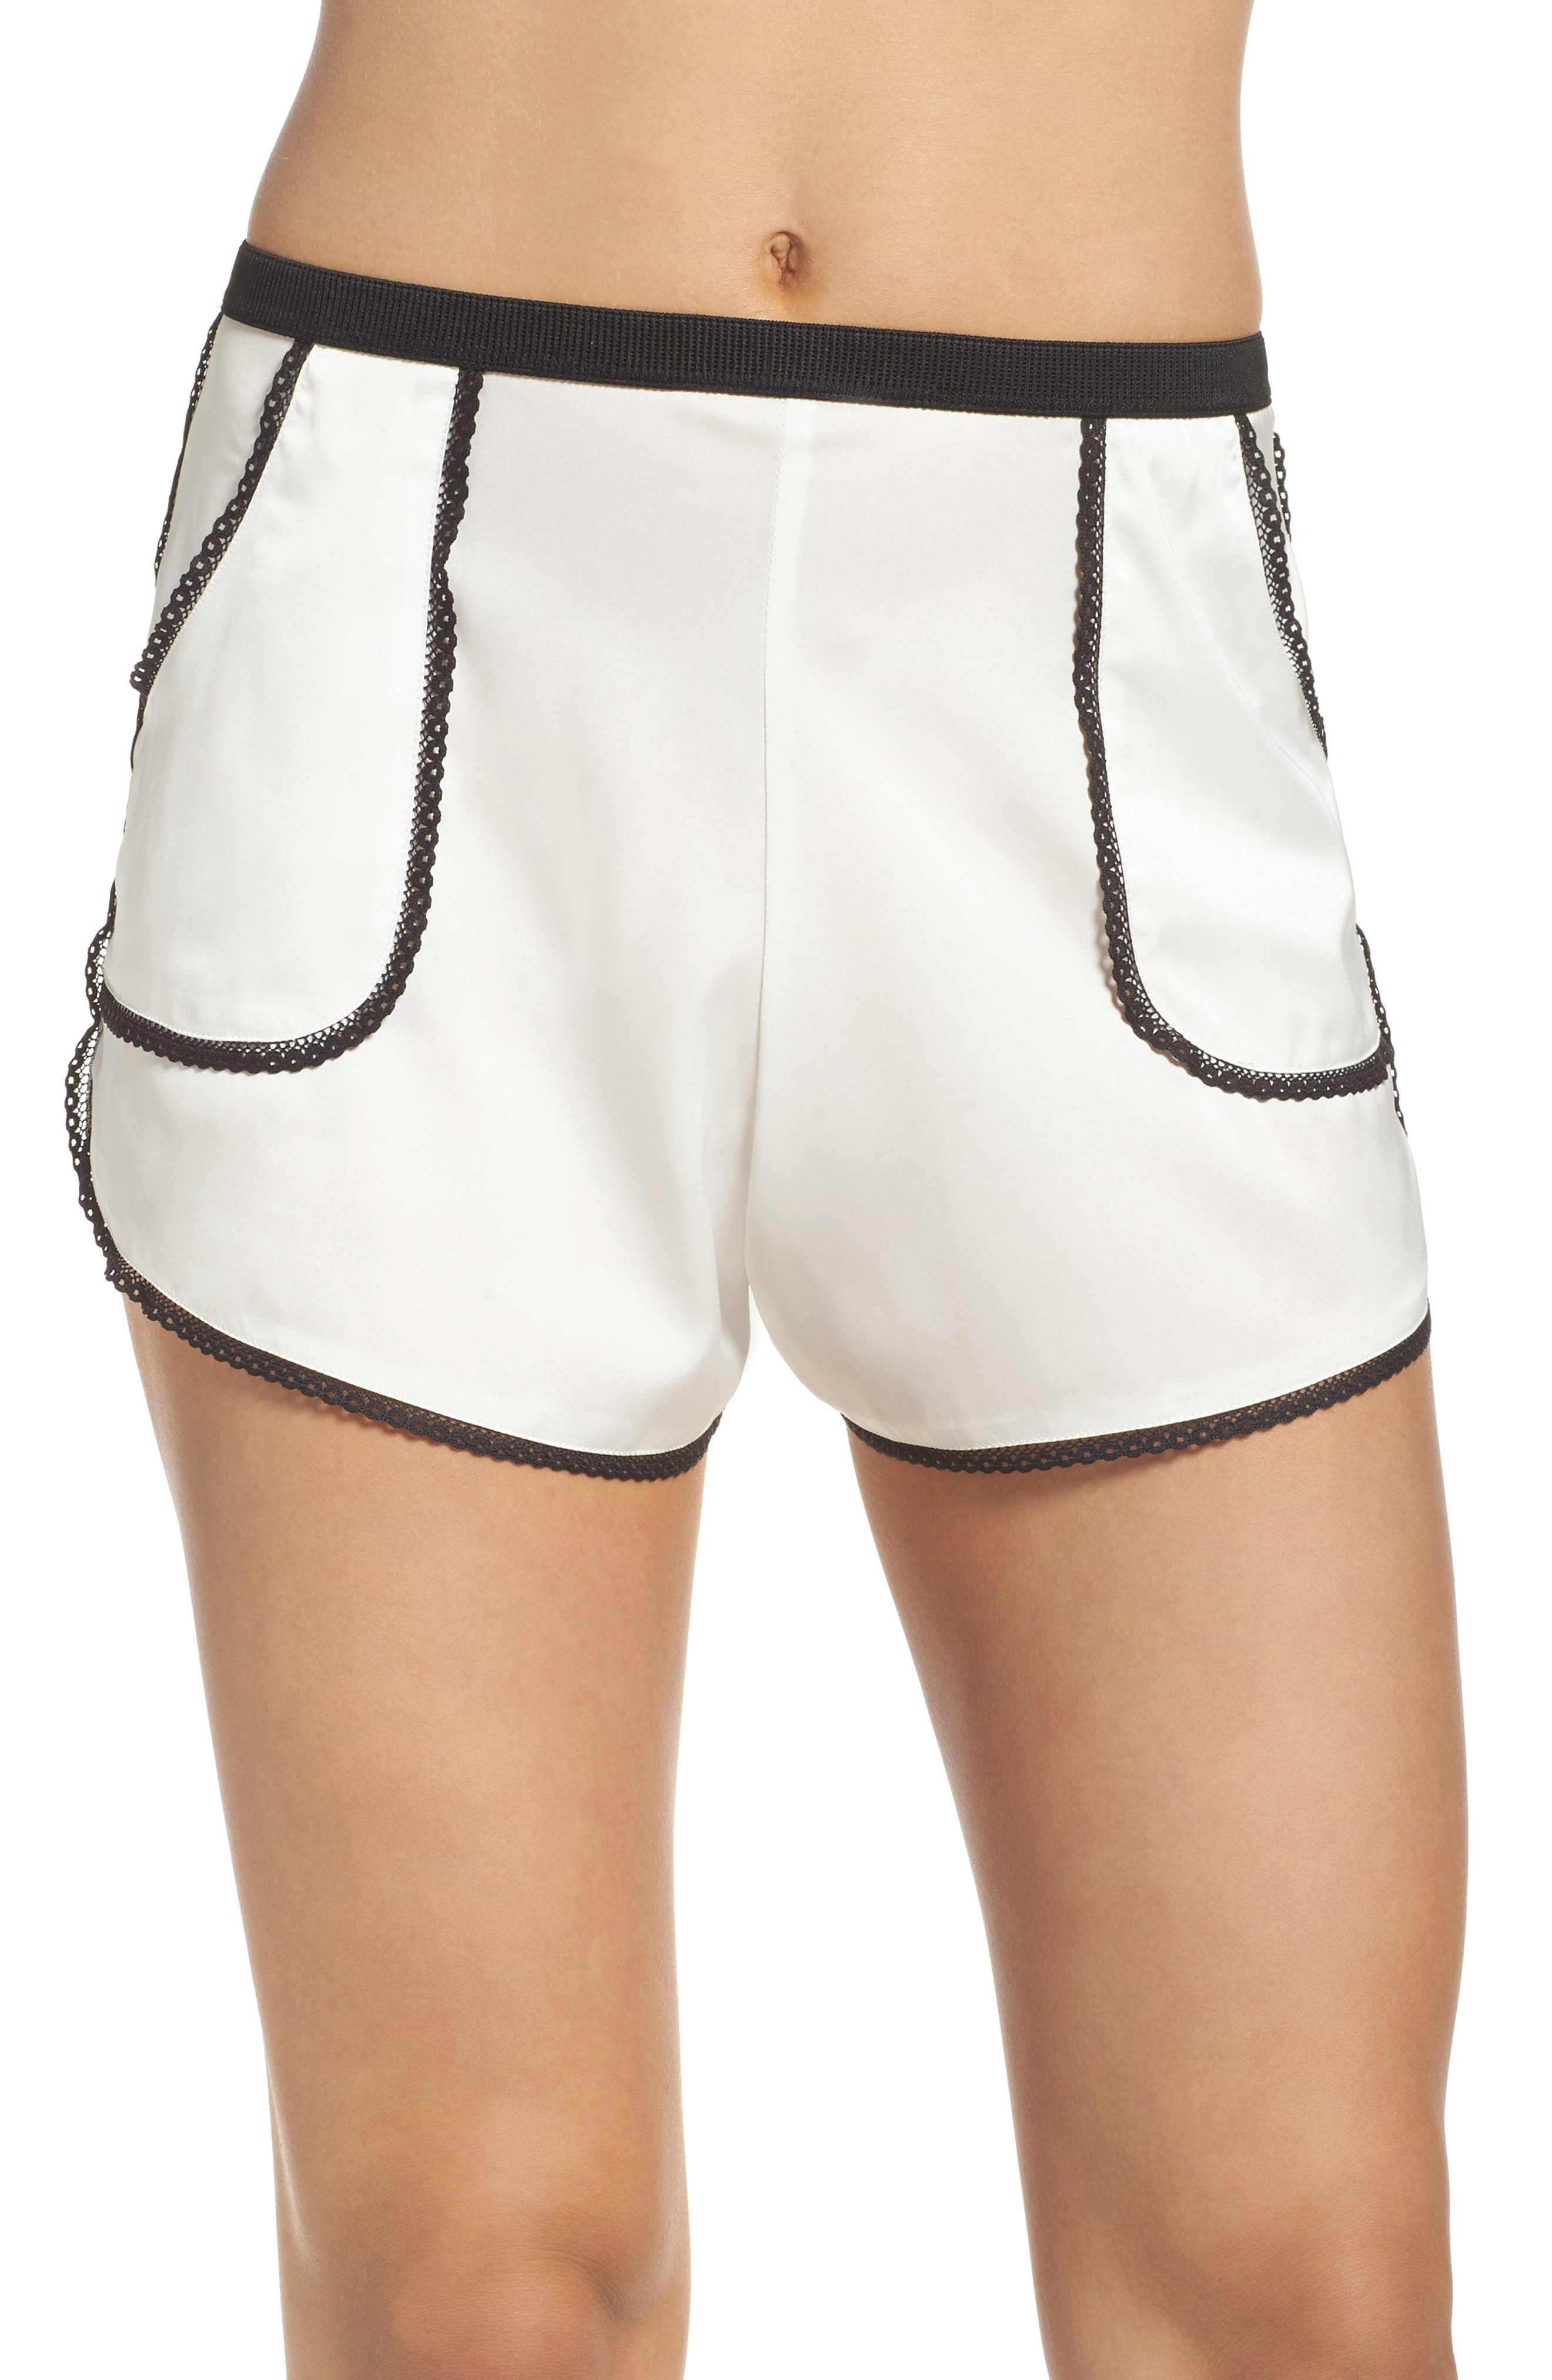 Thistle & Spire Devoe Satin Pajama Shorts,                         Main,                         color, Ivory